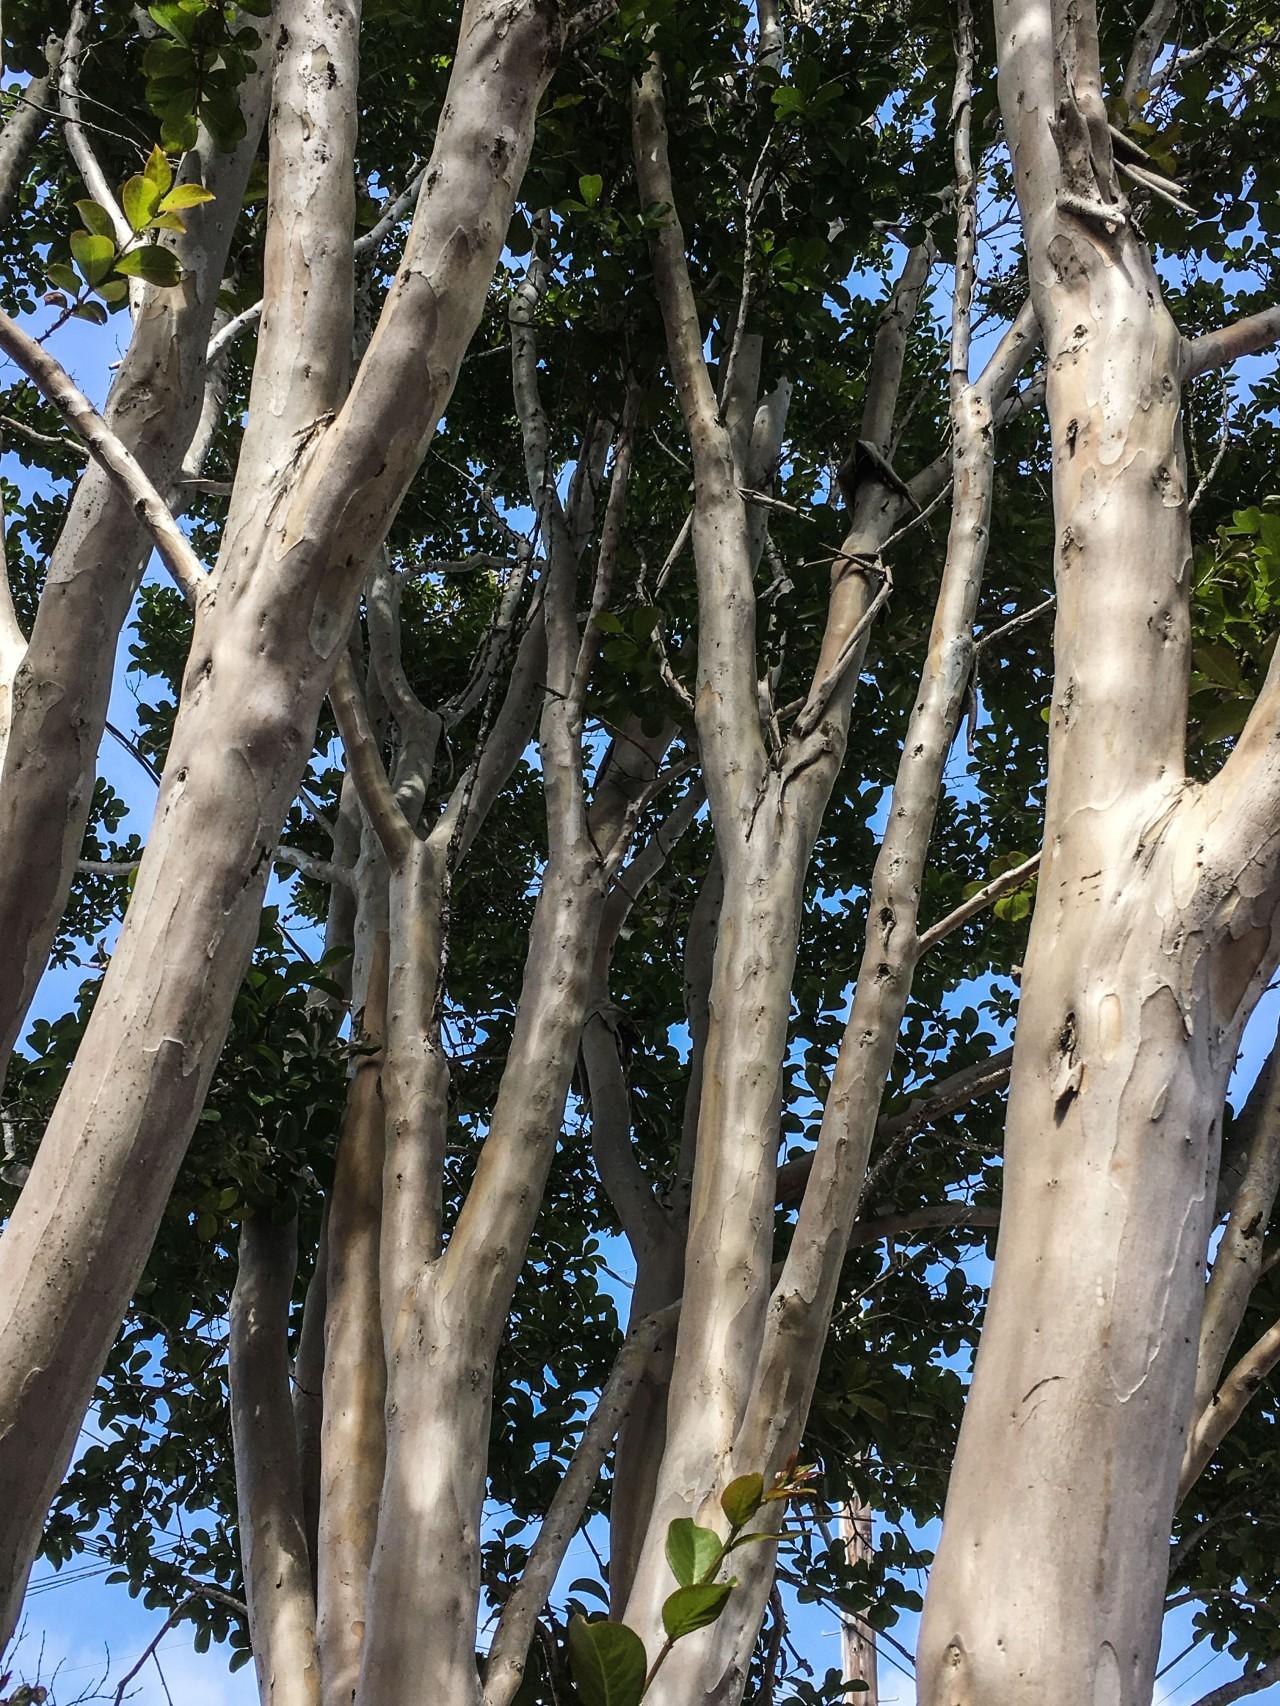 A tree inBerkeley